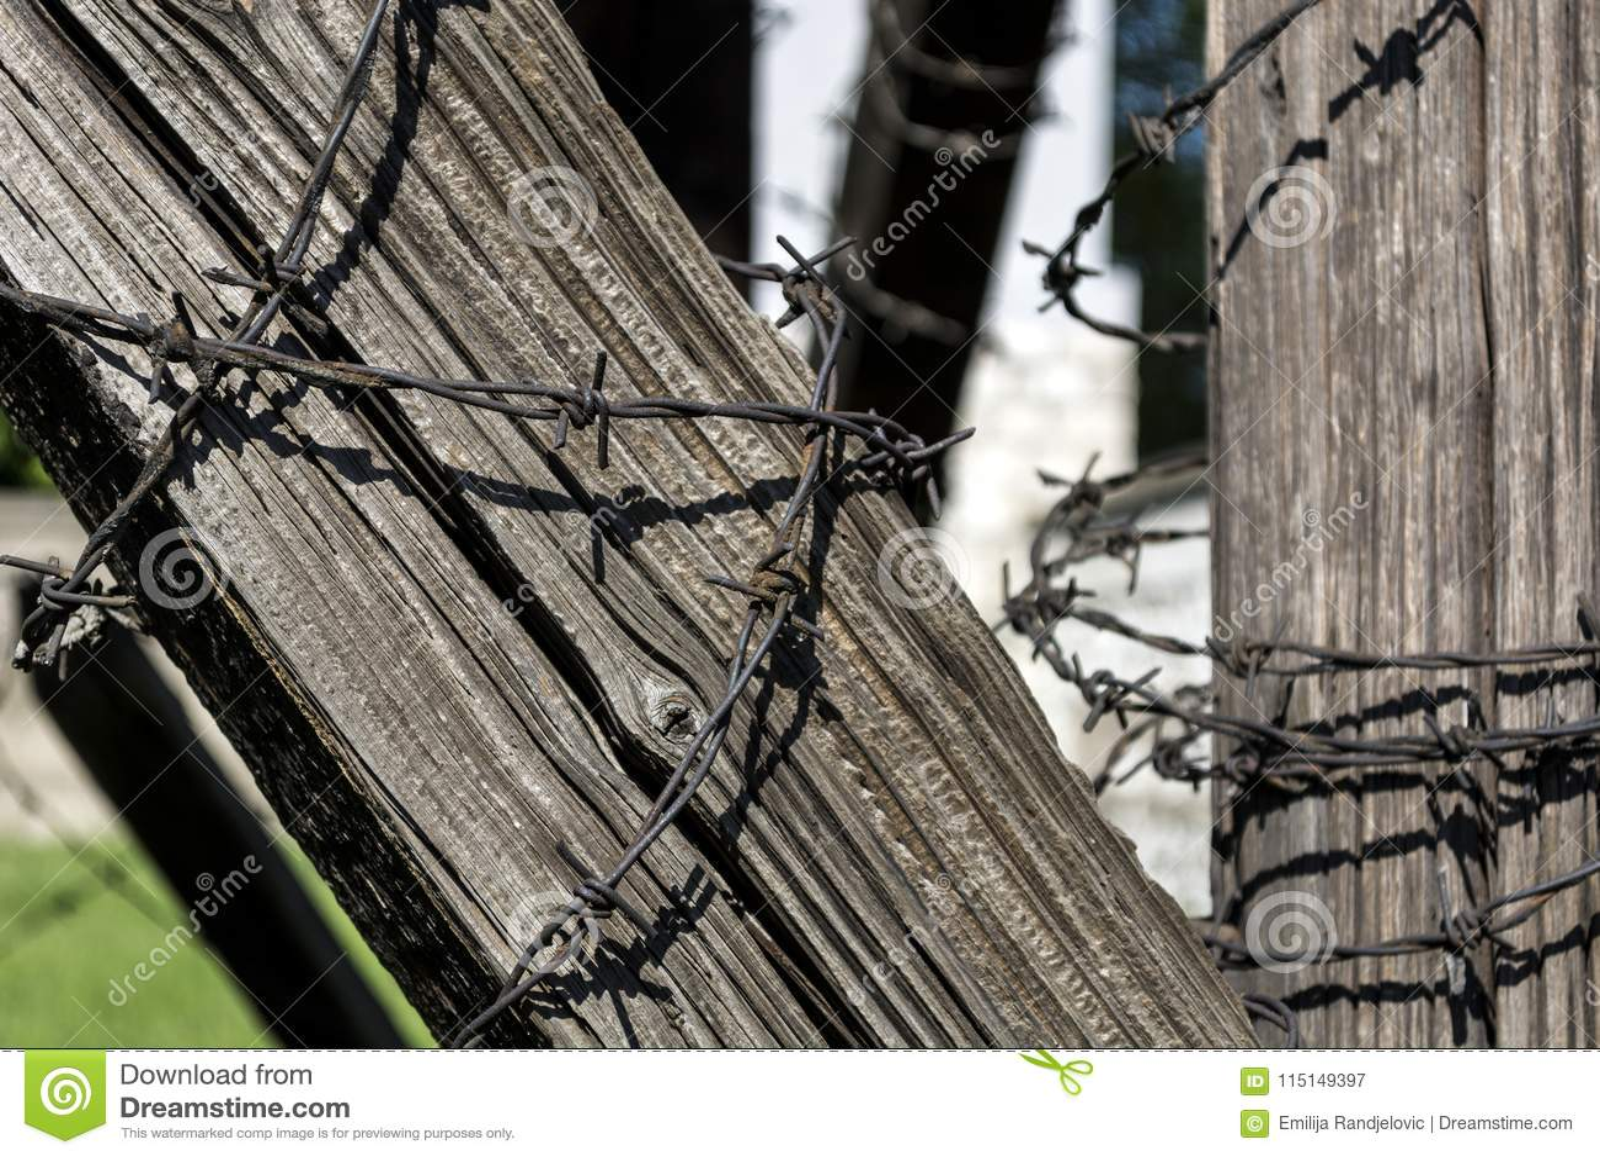 Stacheldraht auf altem Holzbalken